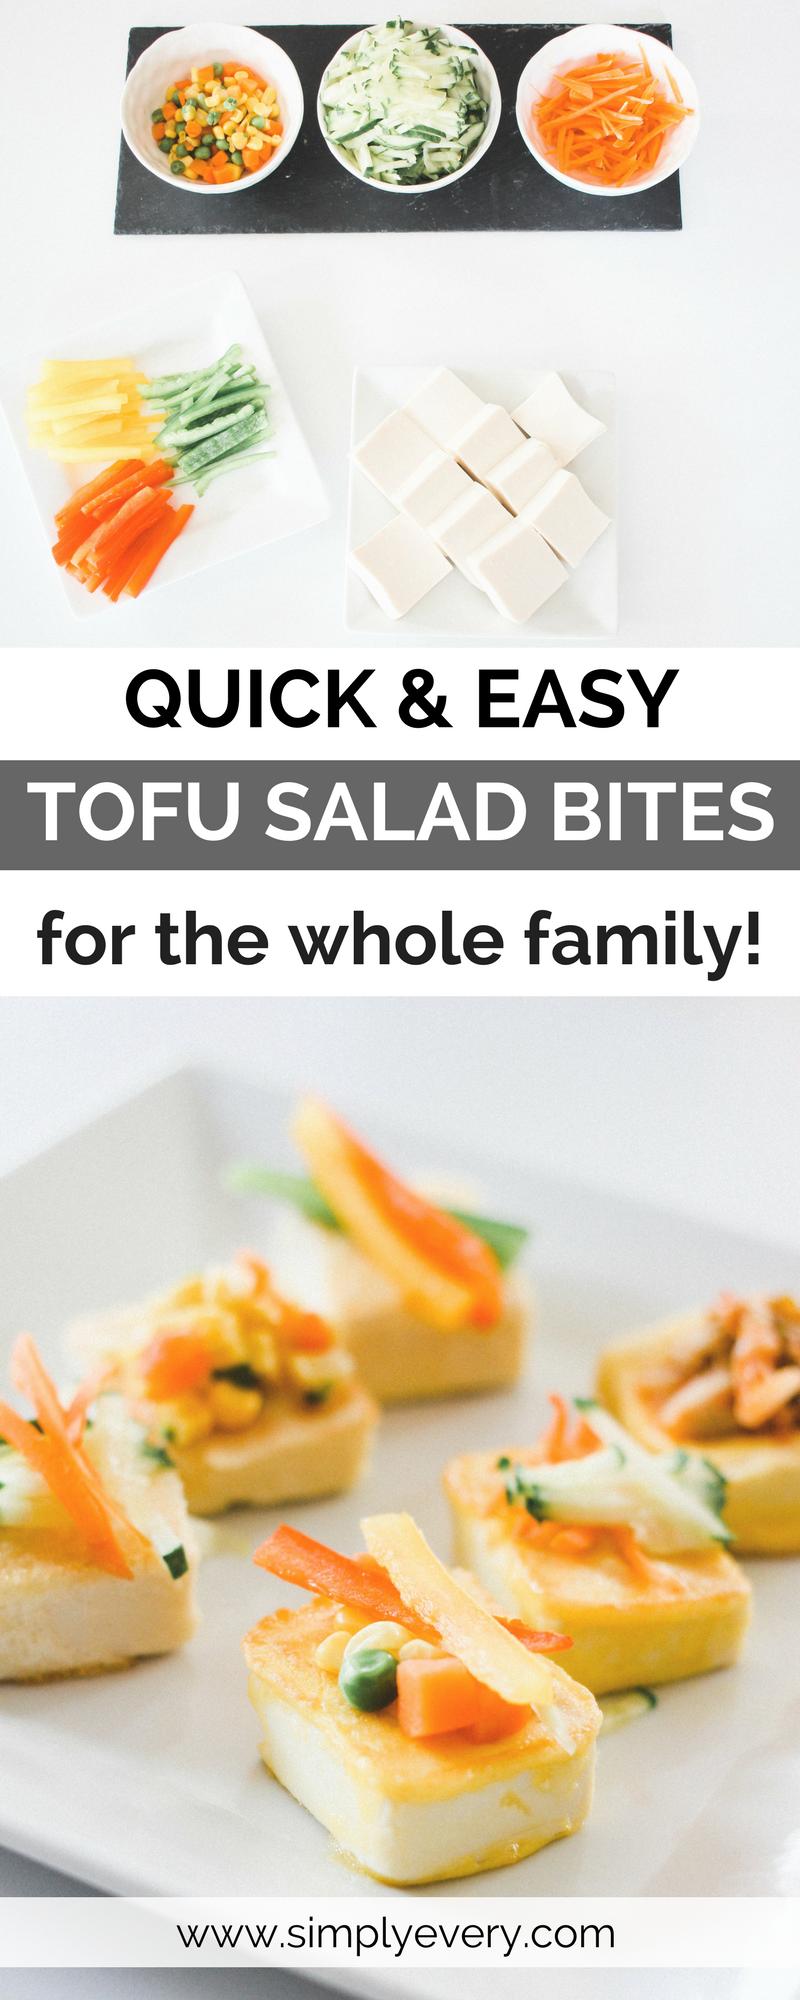 Quick and Easy Tofu Salad Bites